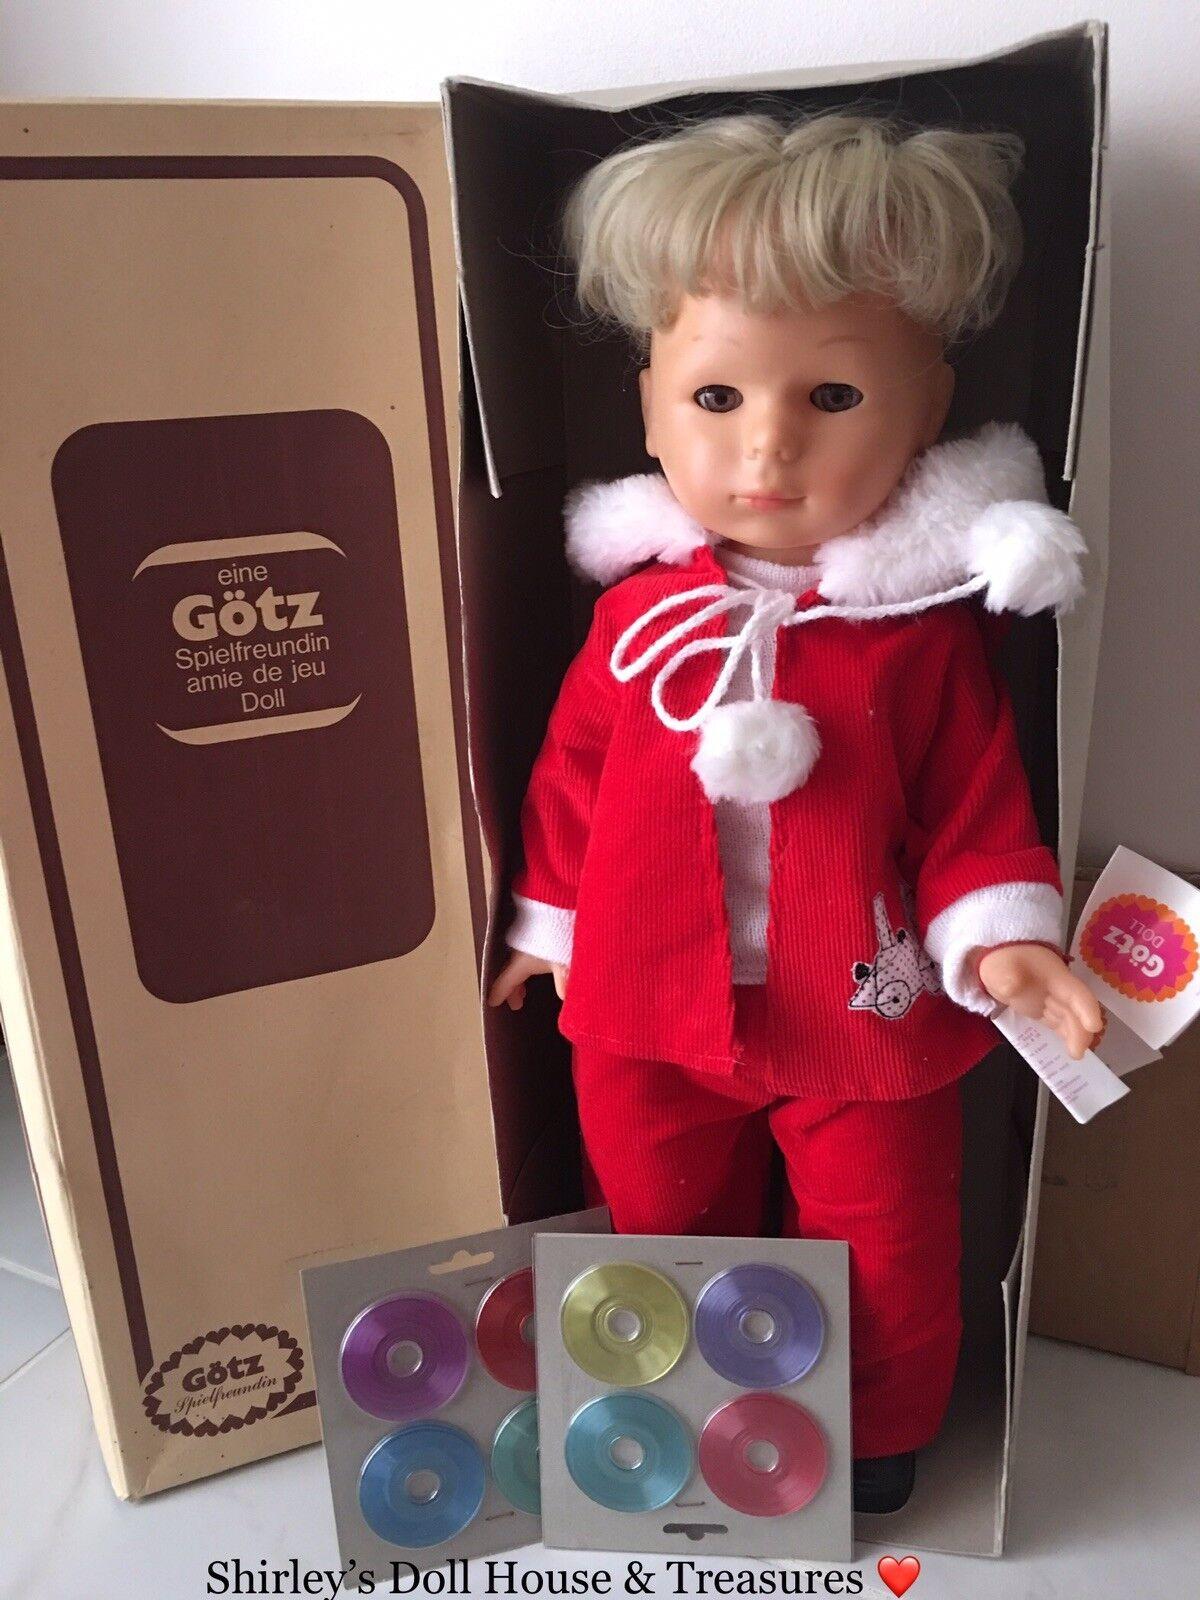 ️Vintage RARE GOTZ Spielfreundin amie de jeu Walking Singing Christmas Doll NIB